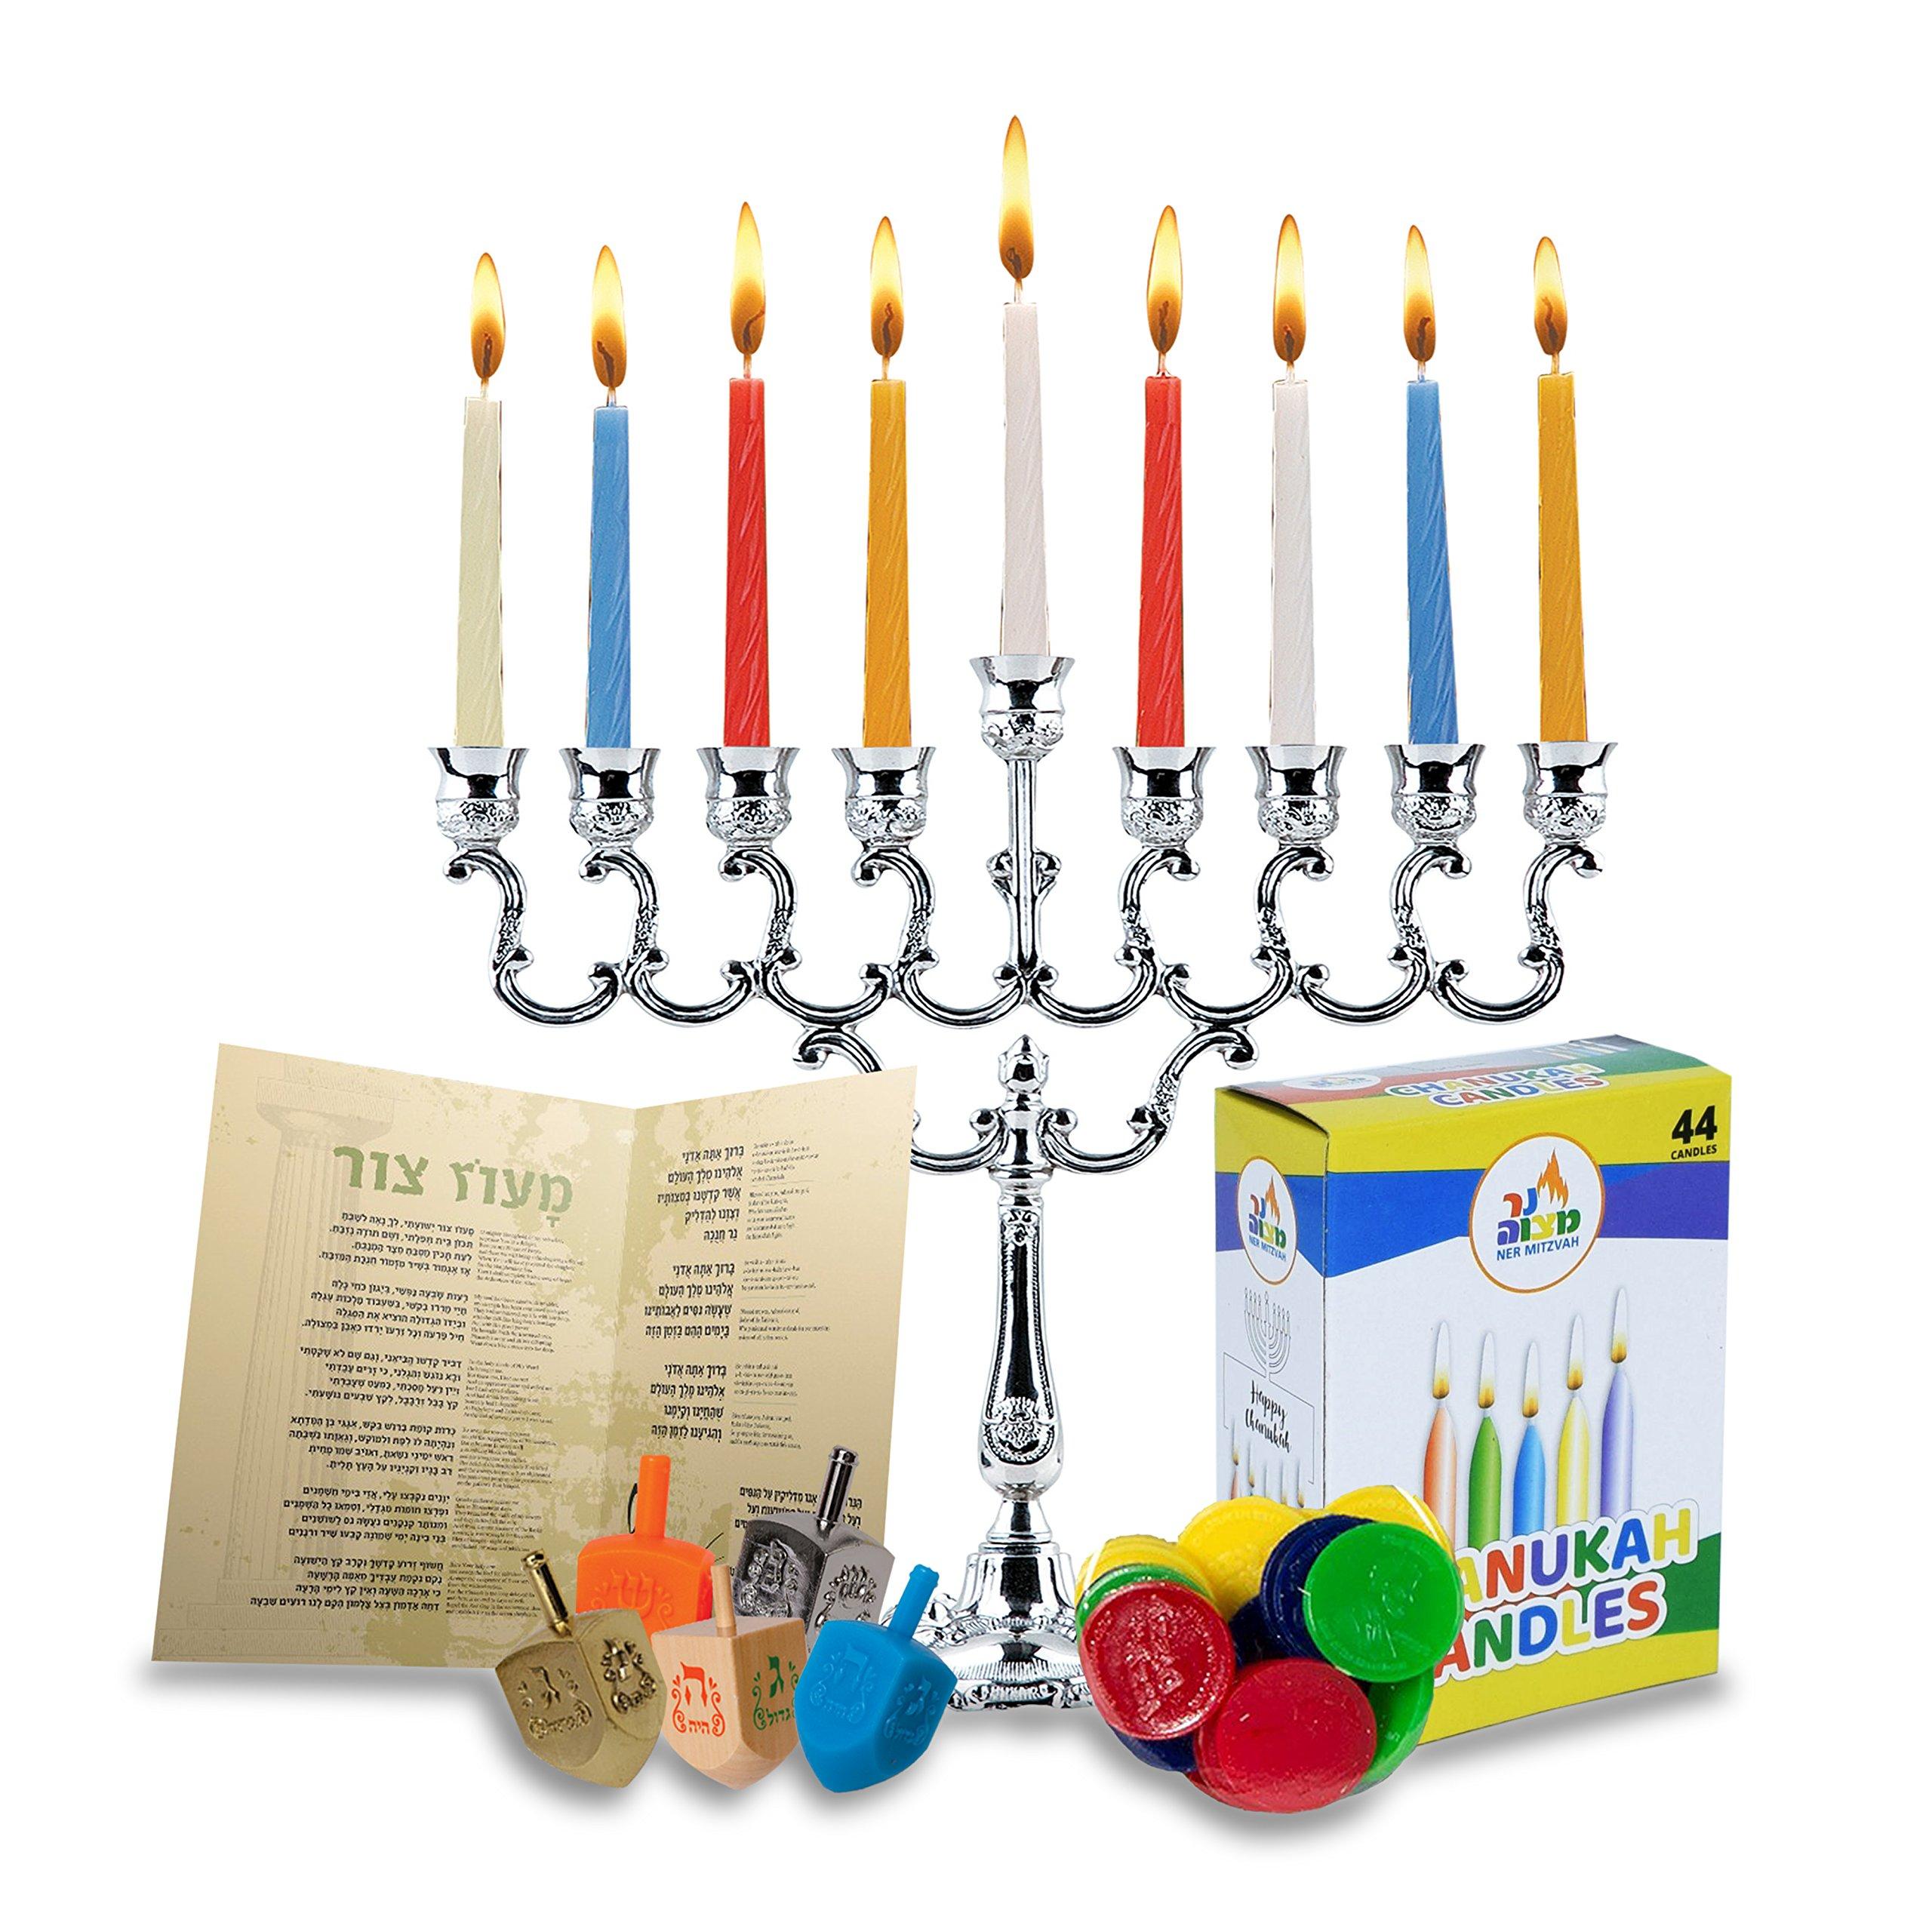 Hanukkah Menorah Complete Set - Menorah - Candles - Dreidels - Chanukah Guide